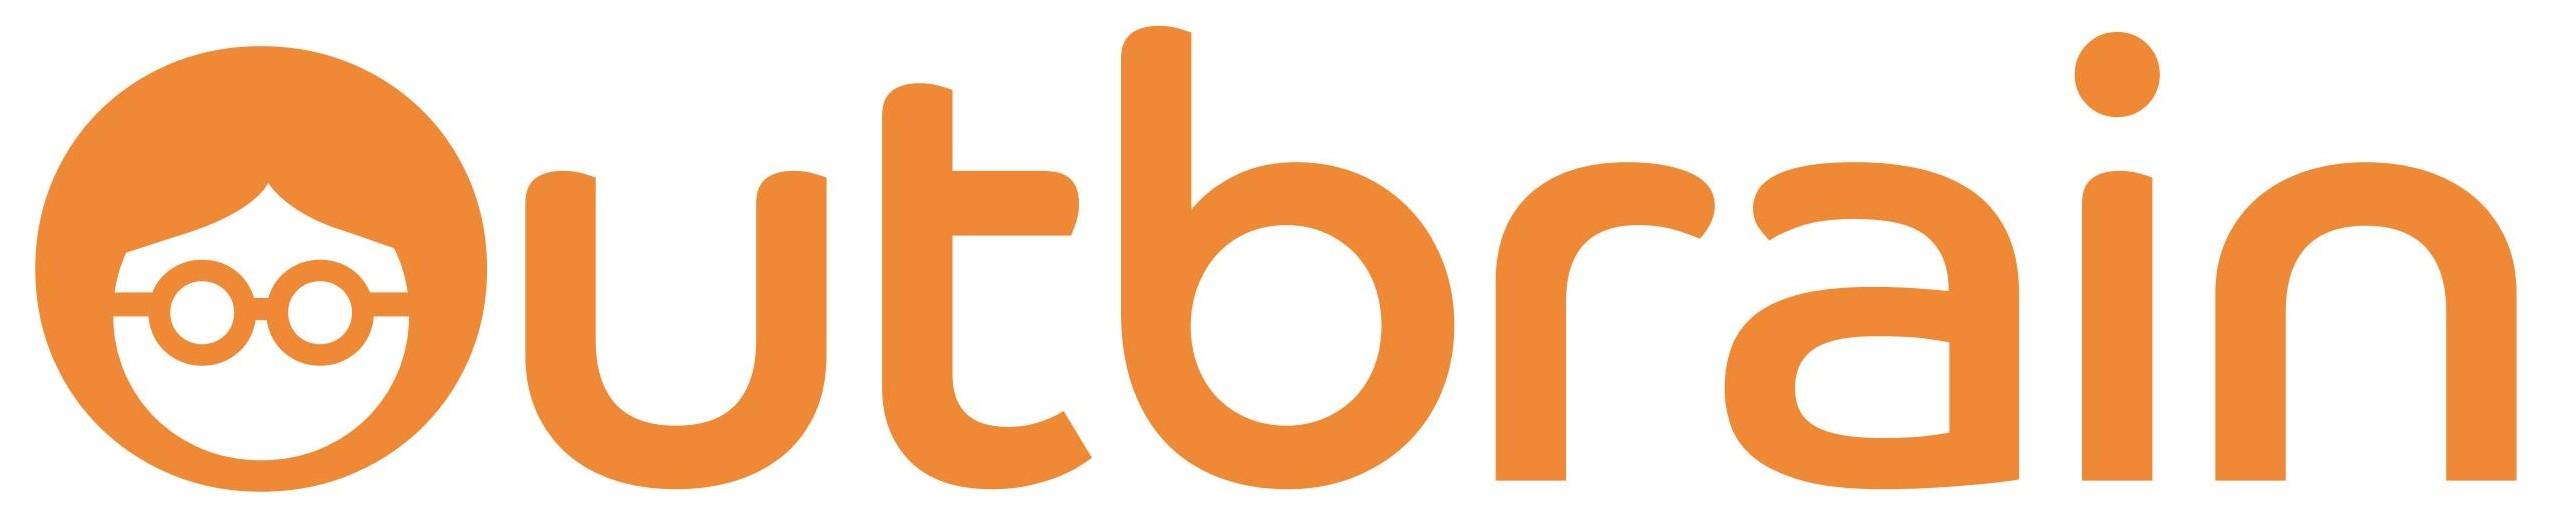 Outbrain-logo - Outbrain Logo Vector PNG